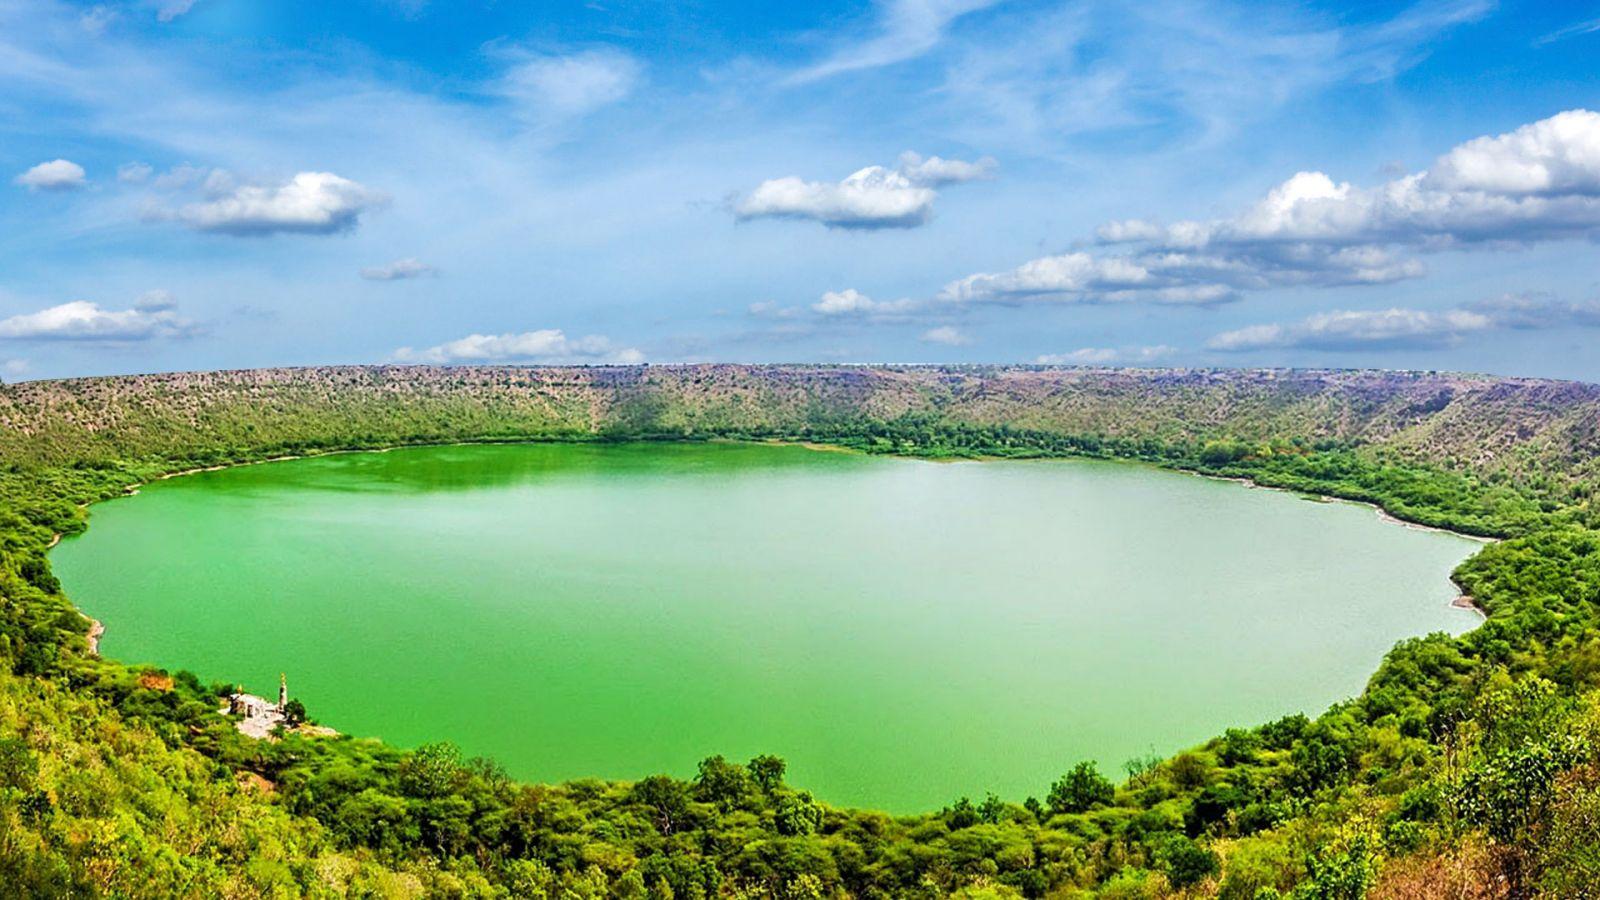 Озеро-кратер Лонар